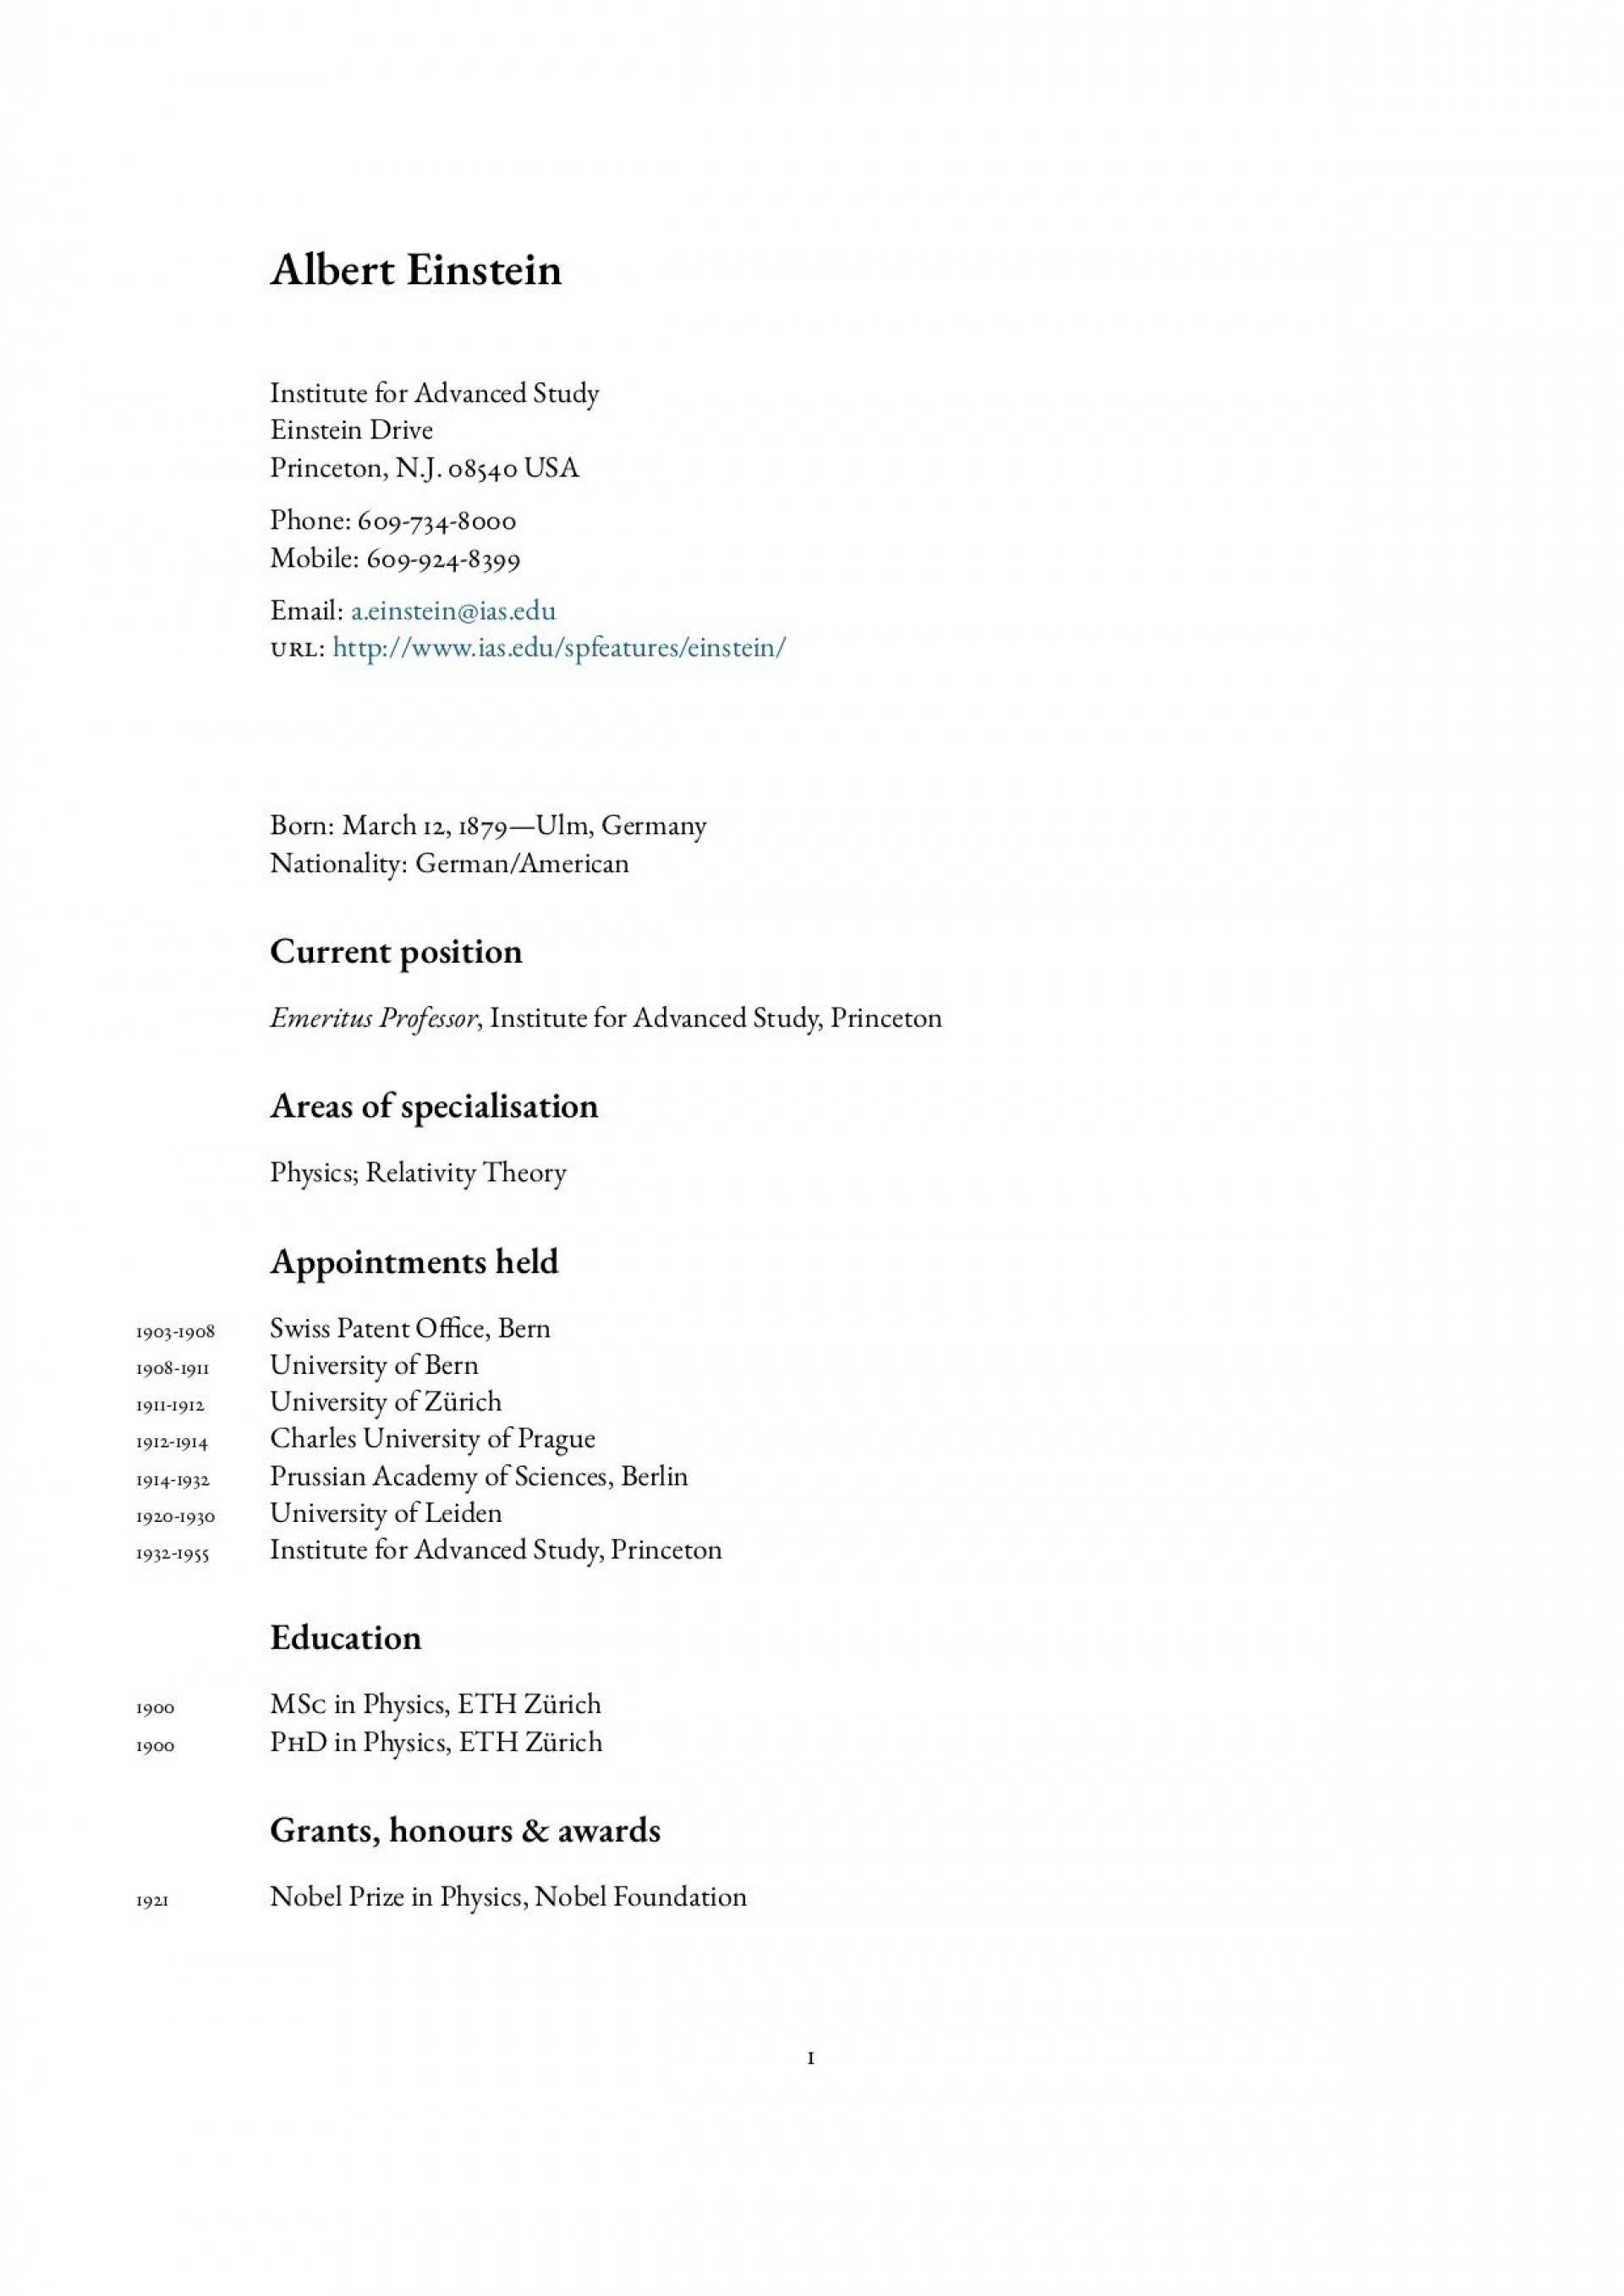 003 Breathtaking Latex Academic Cv Template Concept  Publication Overleaf Economic1920